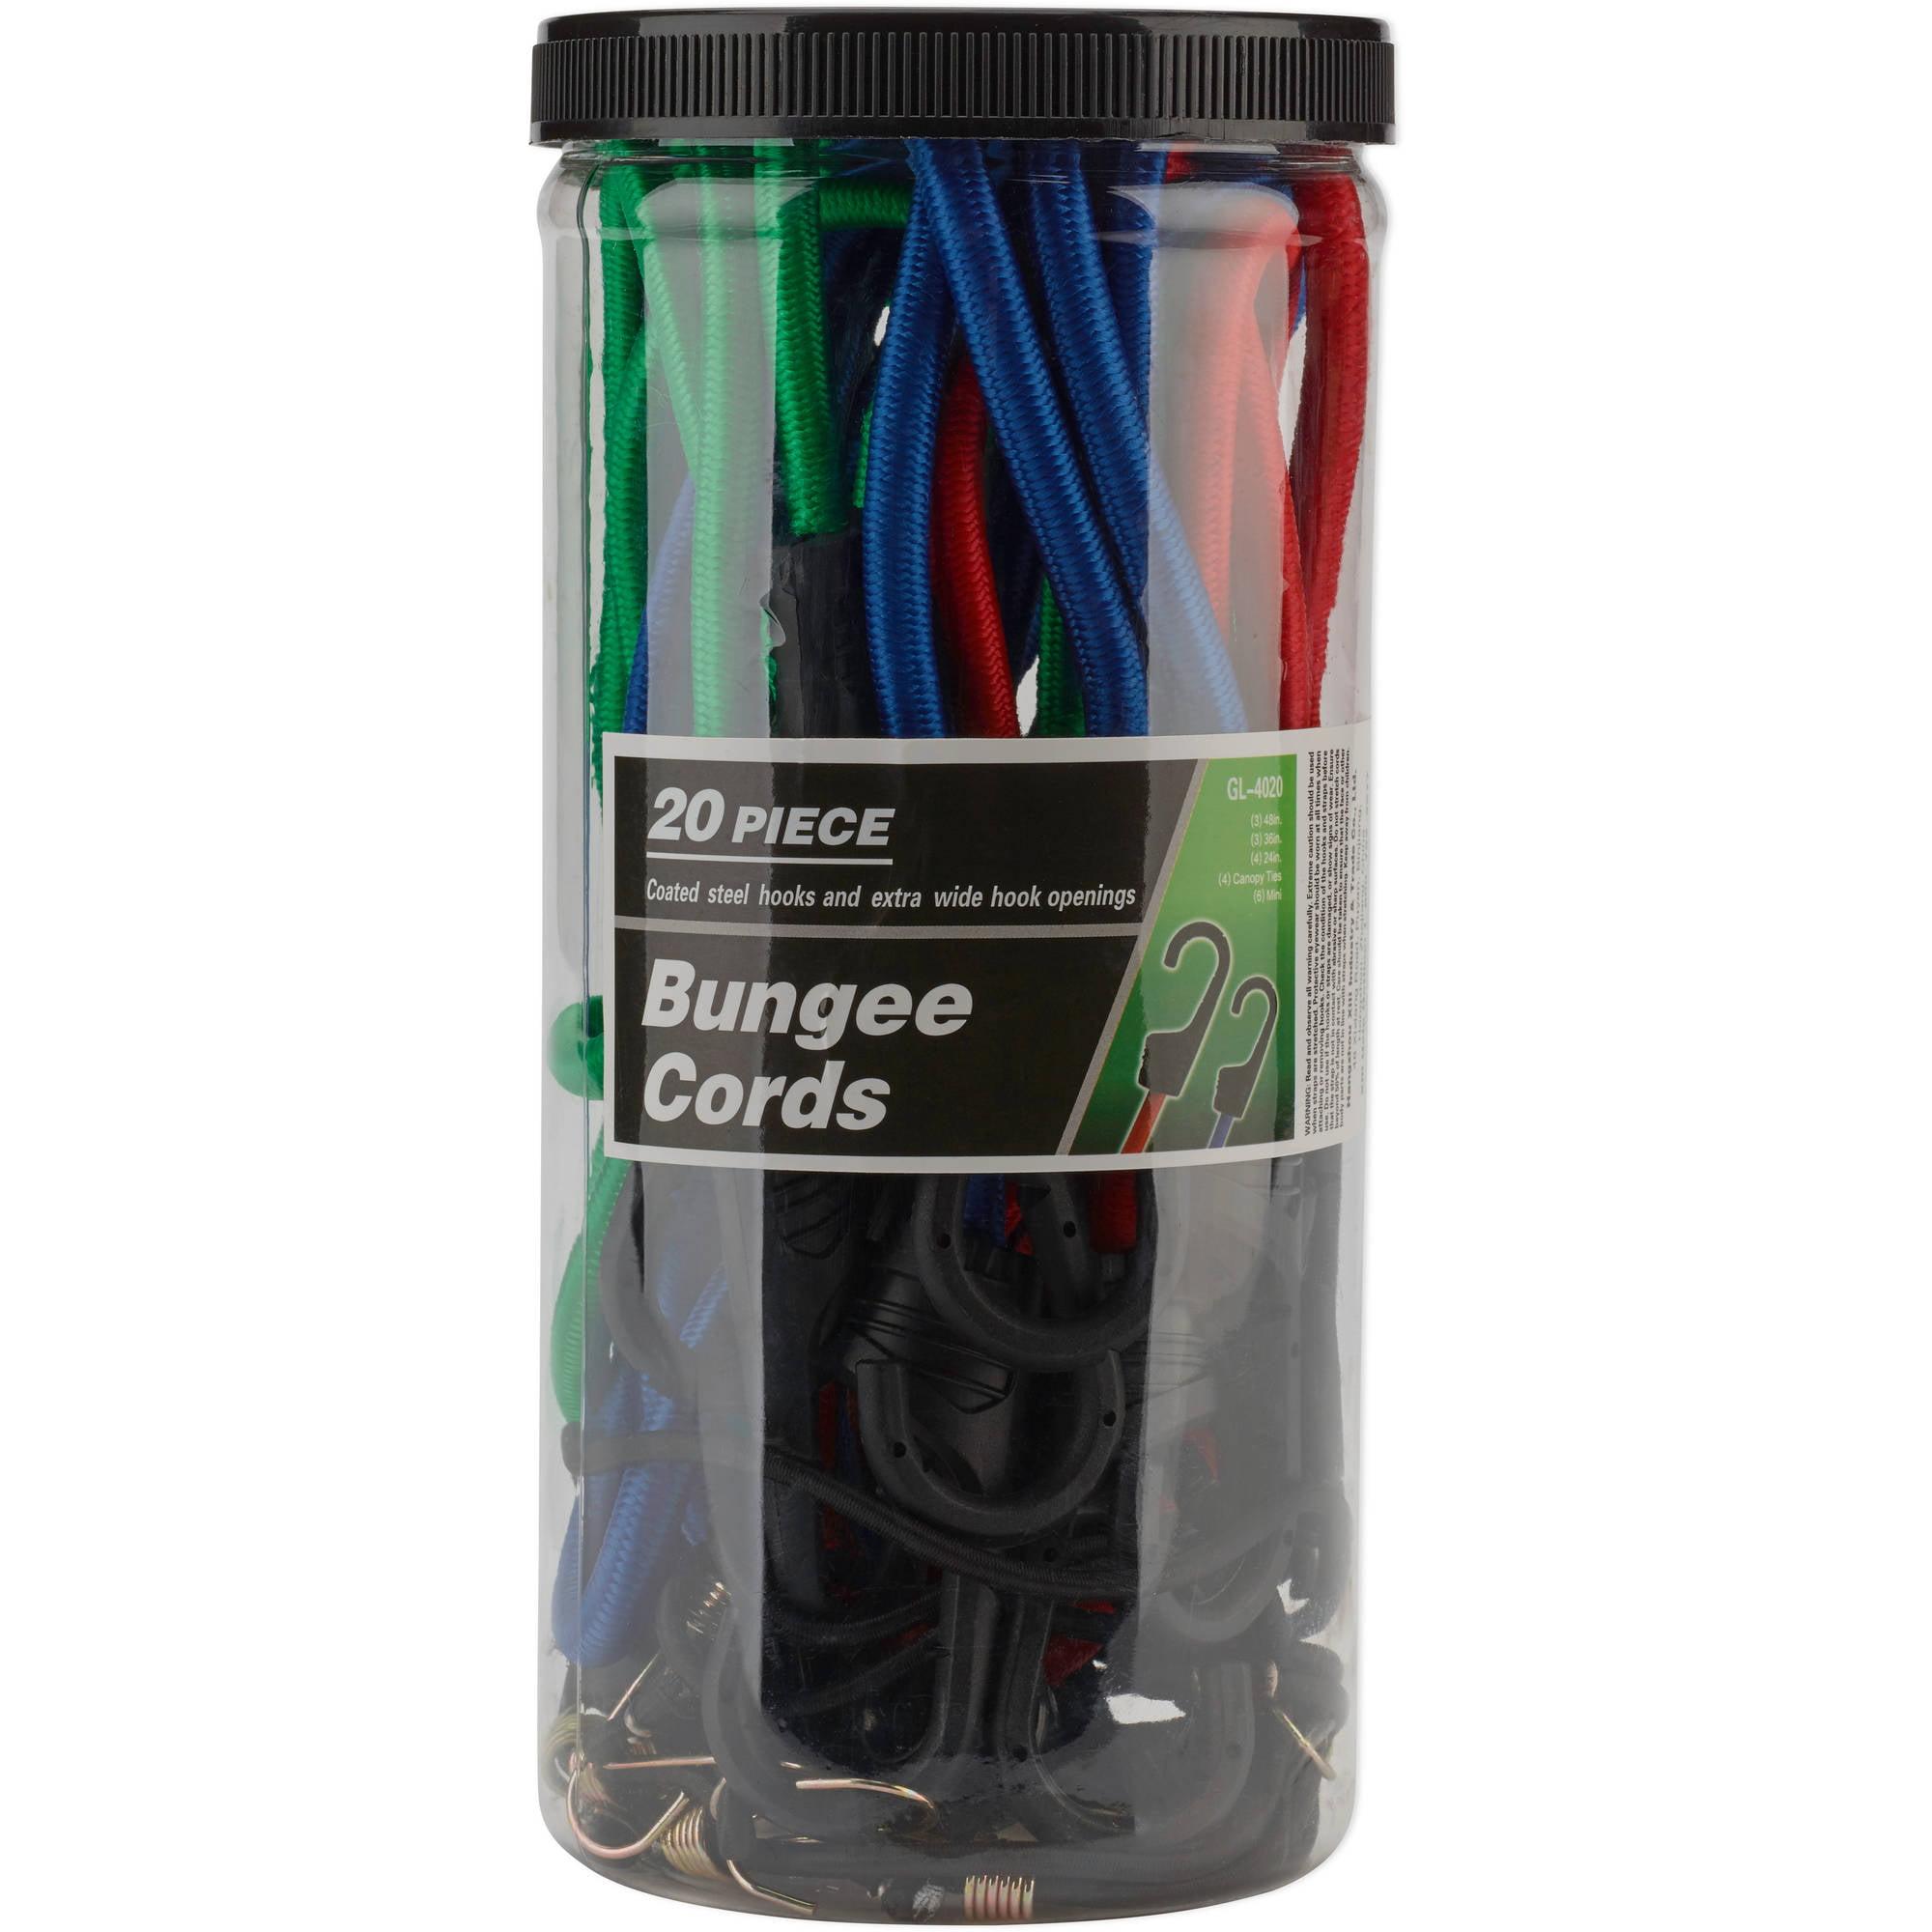 20-Piece Bungee Cord Set